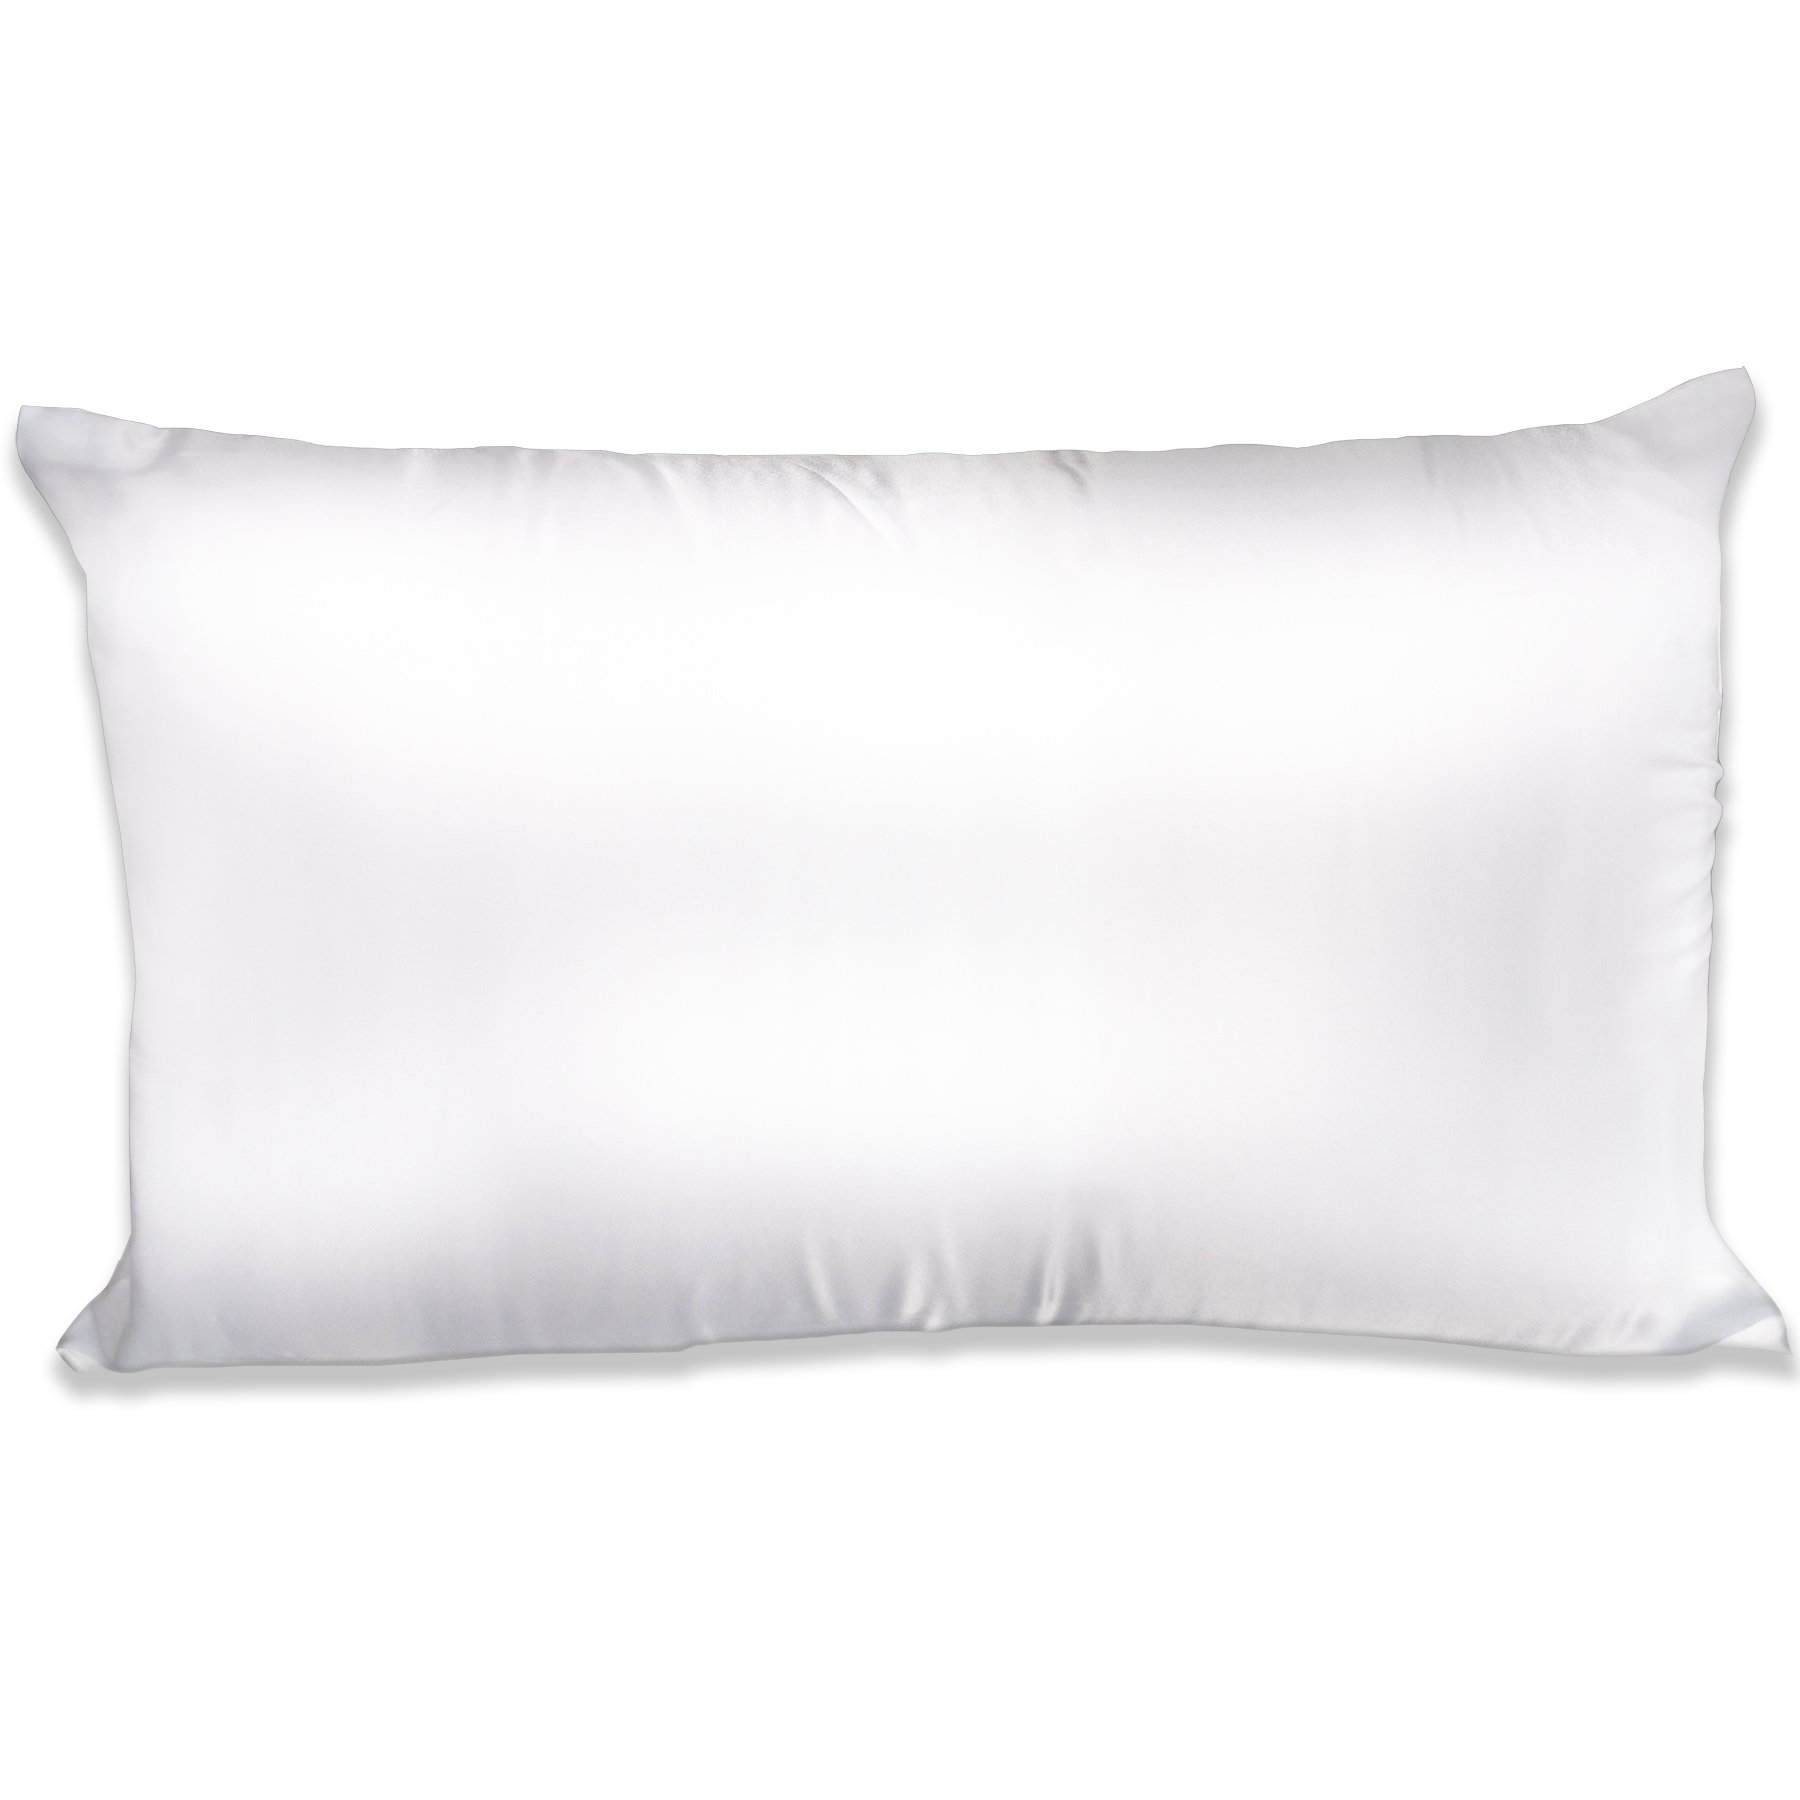 Amazon.com : Spasilk 100% Pure Silk Standard Size Crib